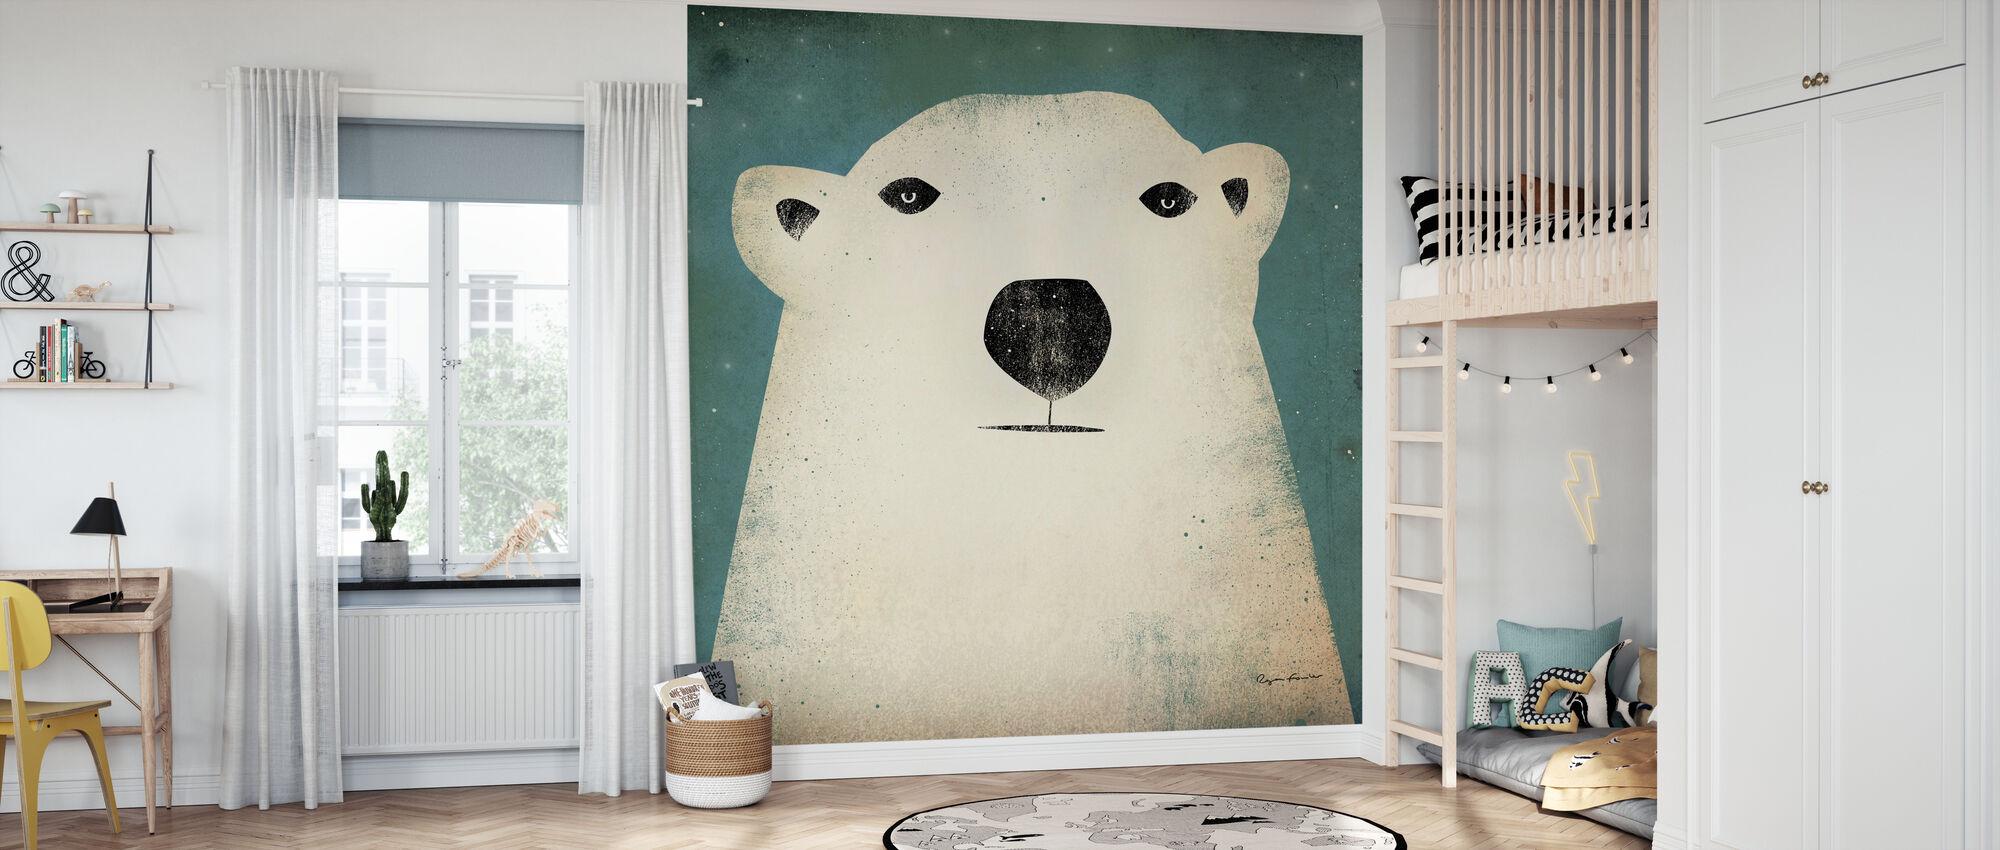 Ryan Fowler - Polar Bear - Wallpaper - Kids Room